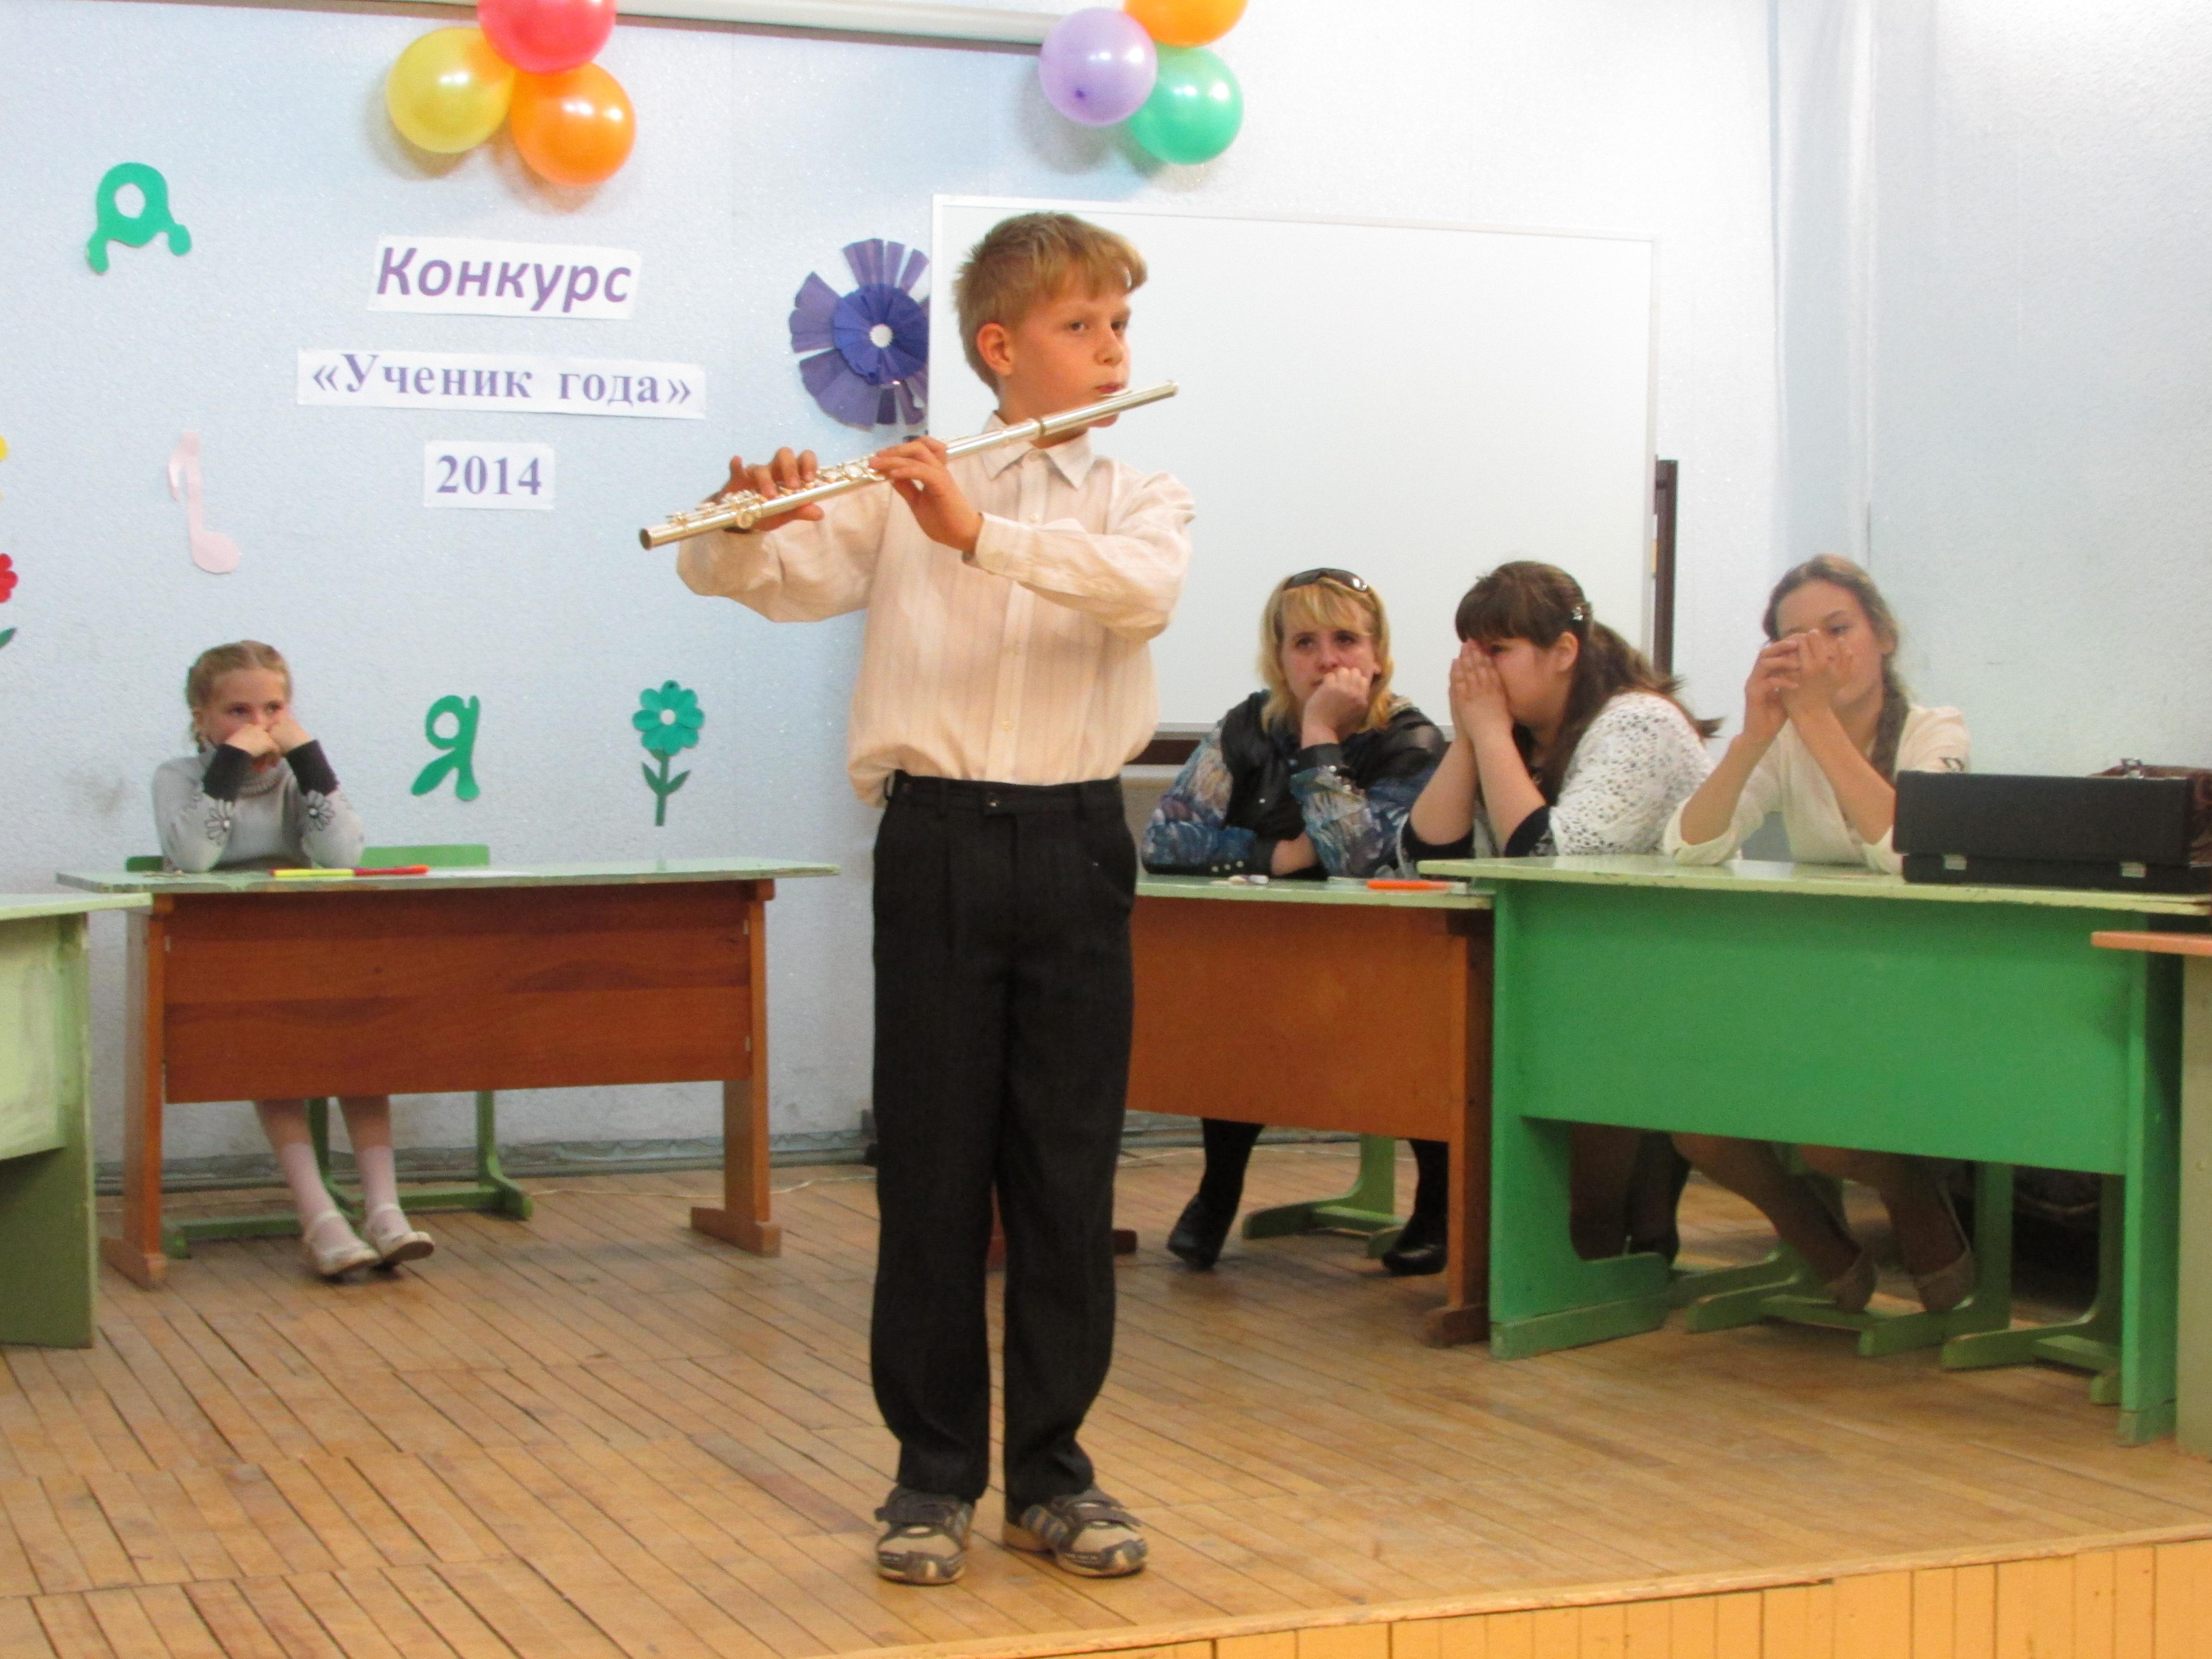 Как представить себя на конкурсе юноше